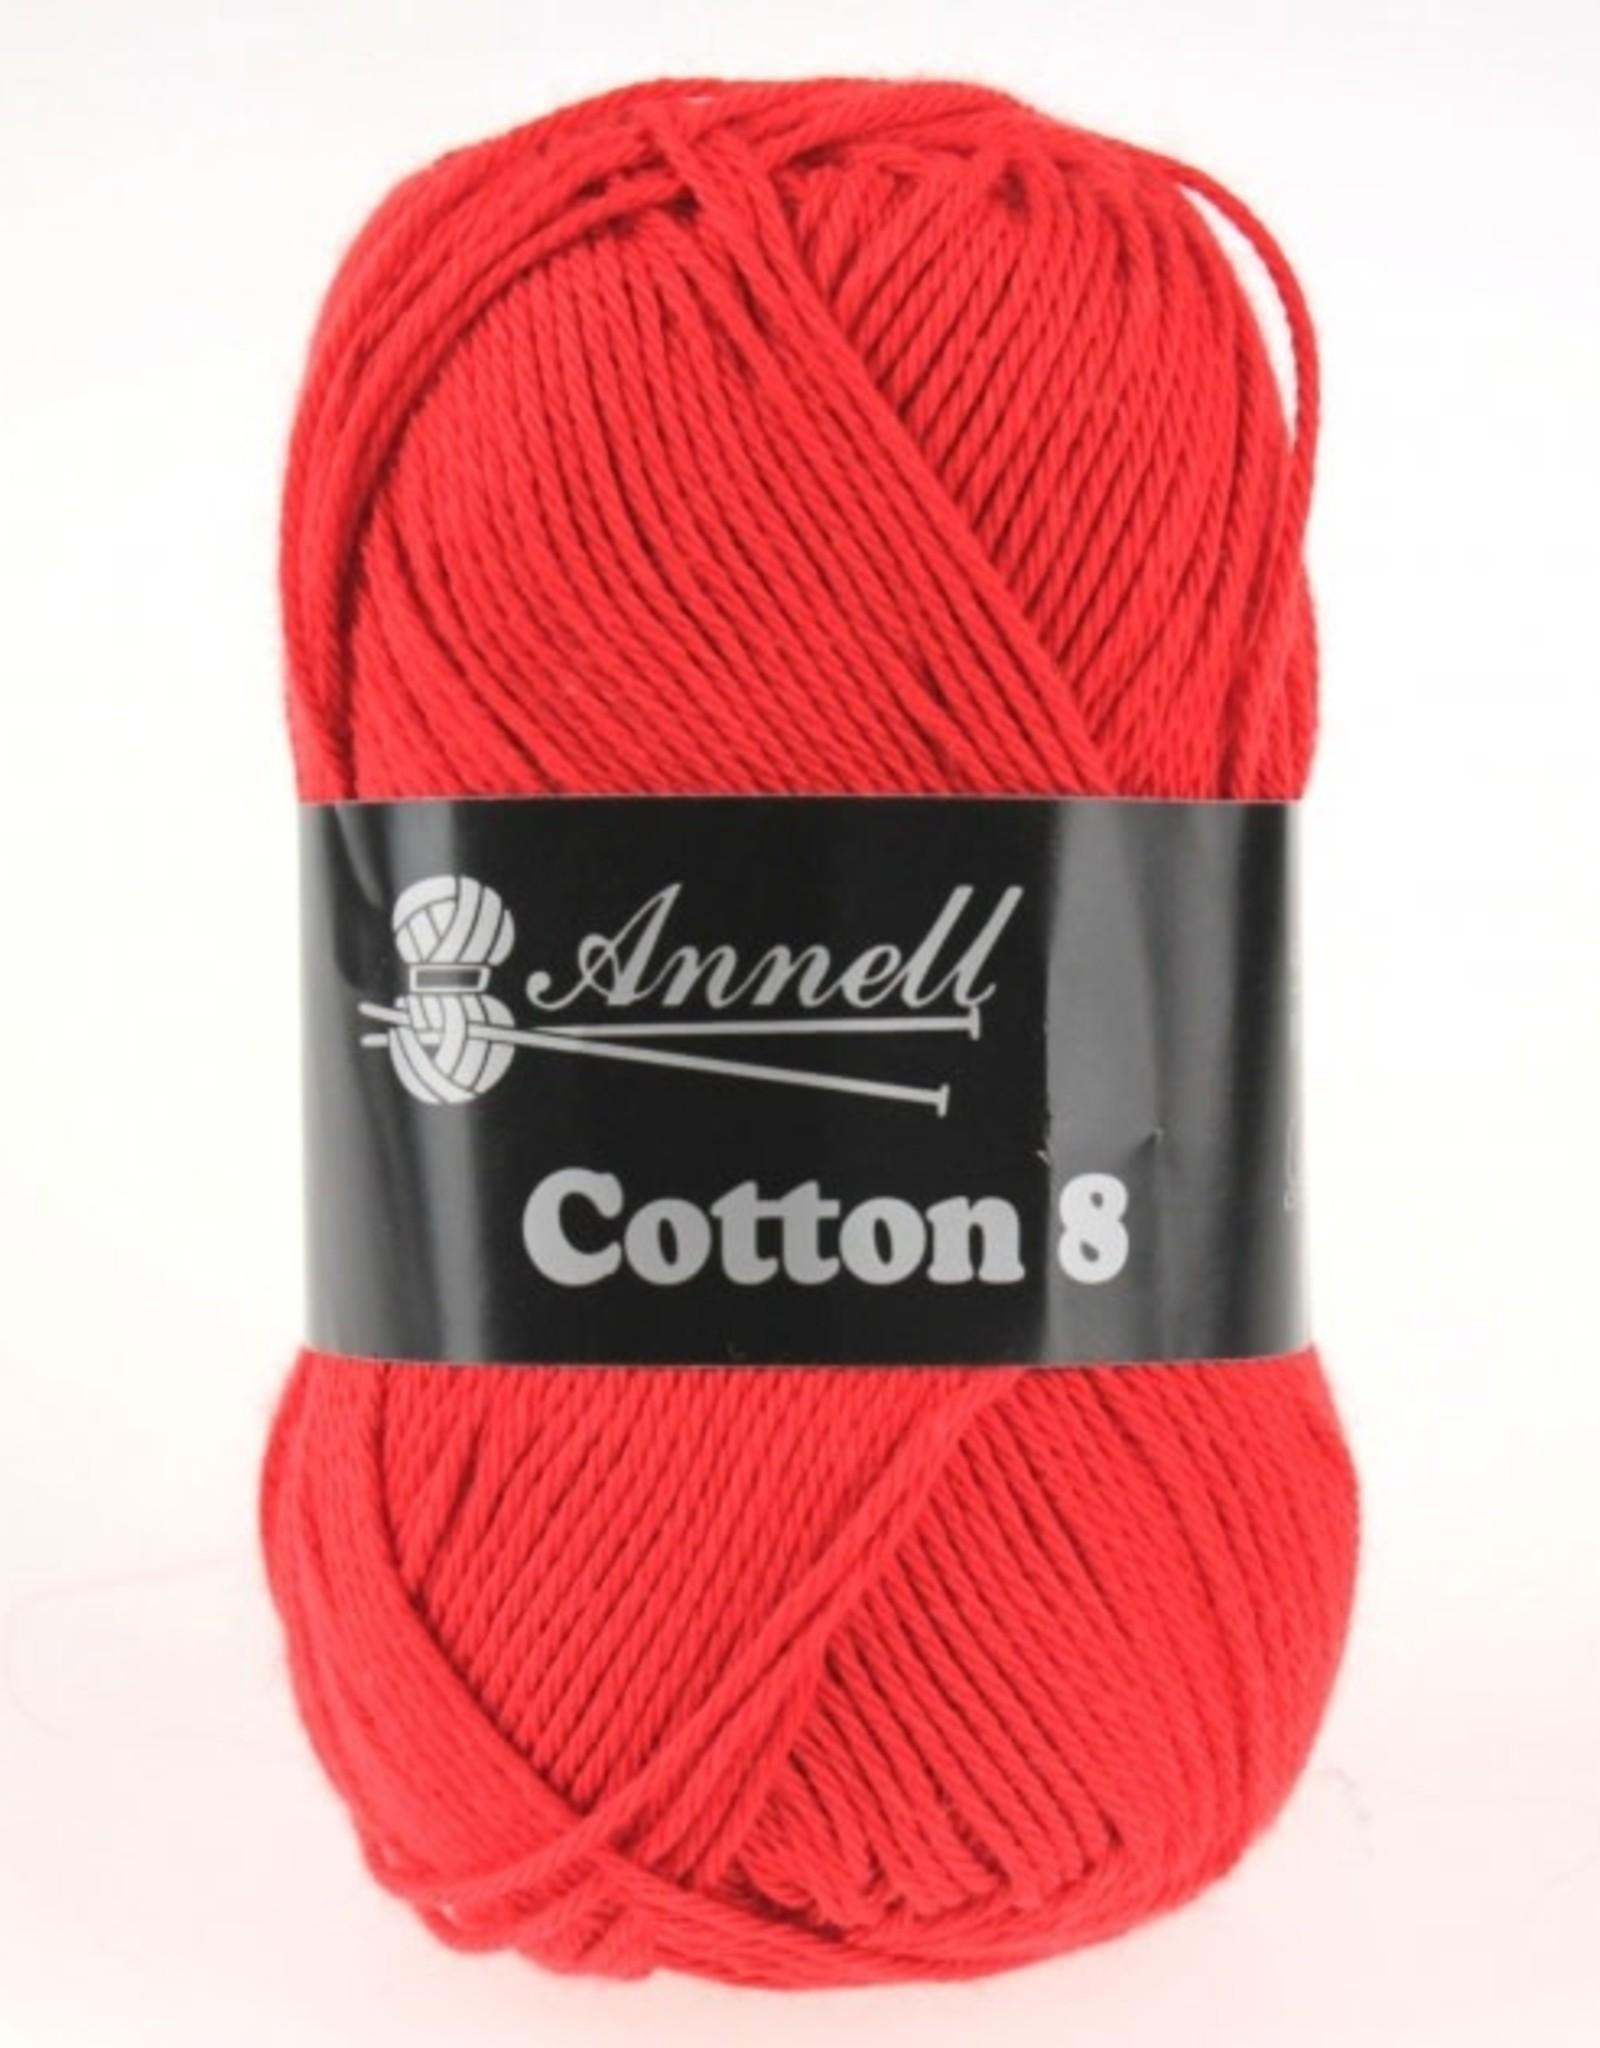 Annell Annell Cotton 8 12